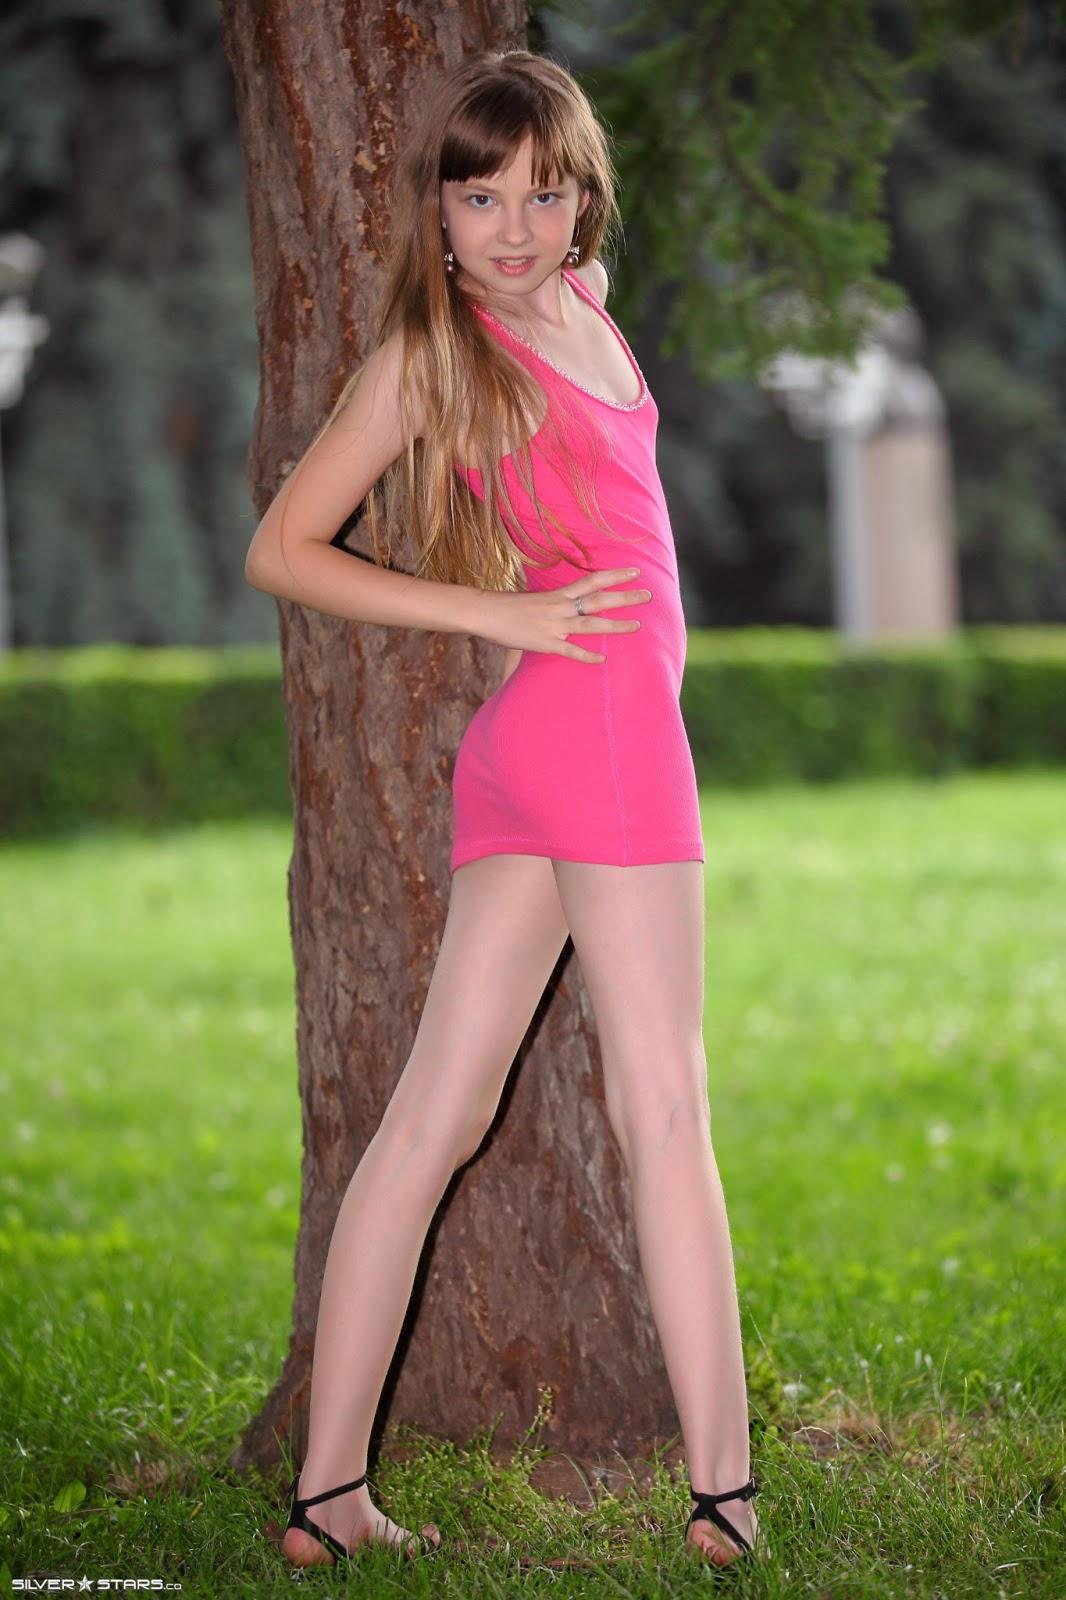 Bella Silver Stars Models